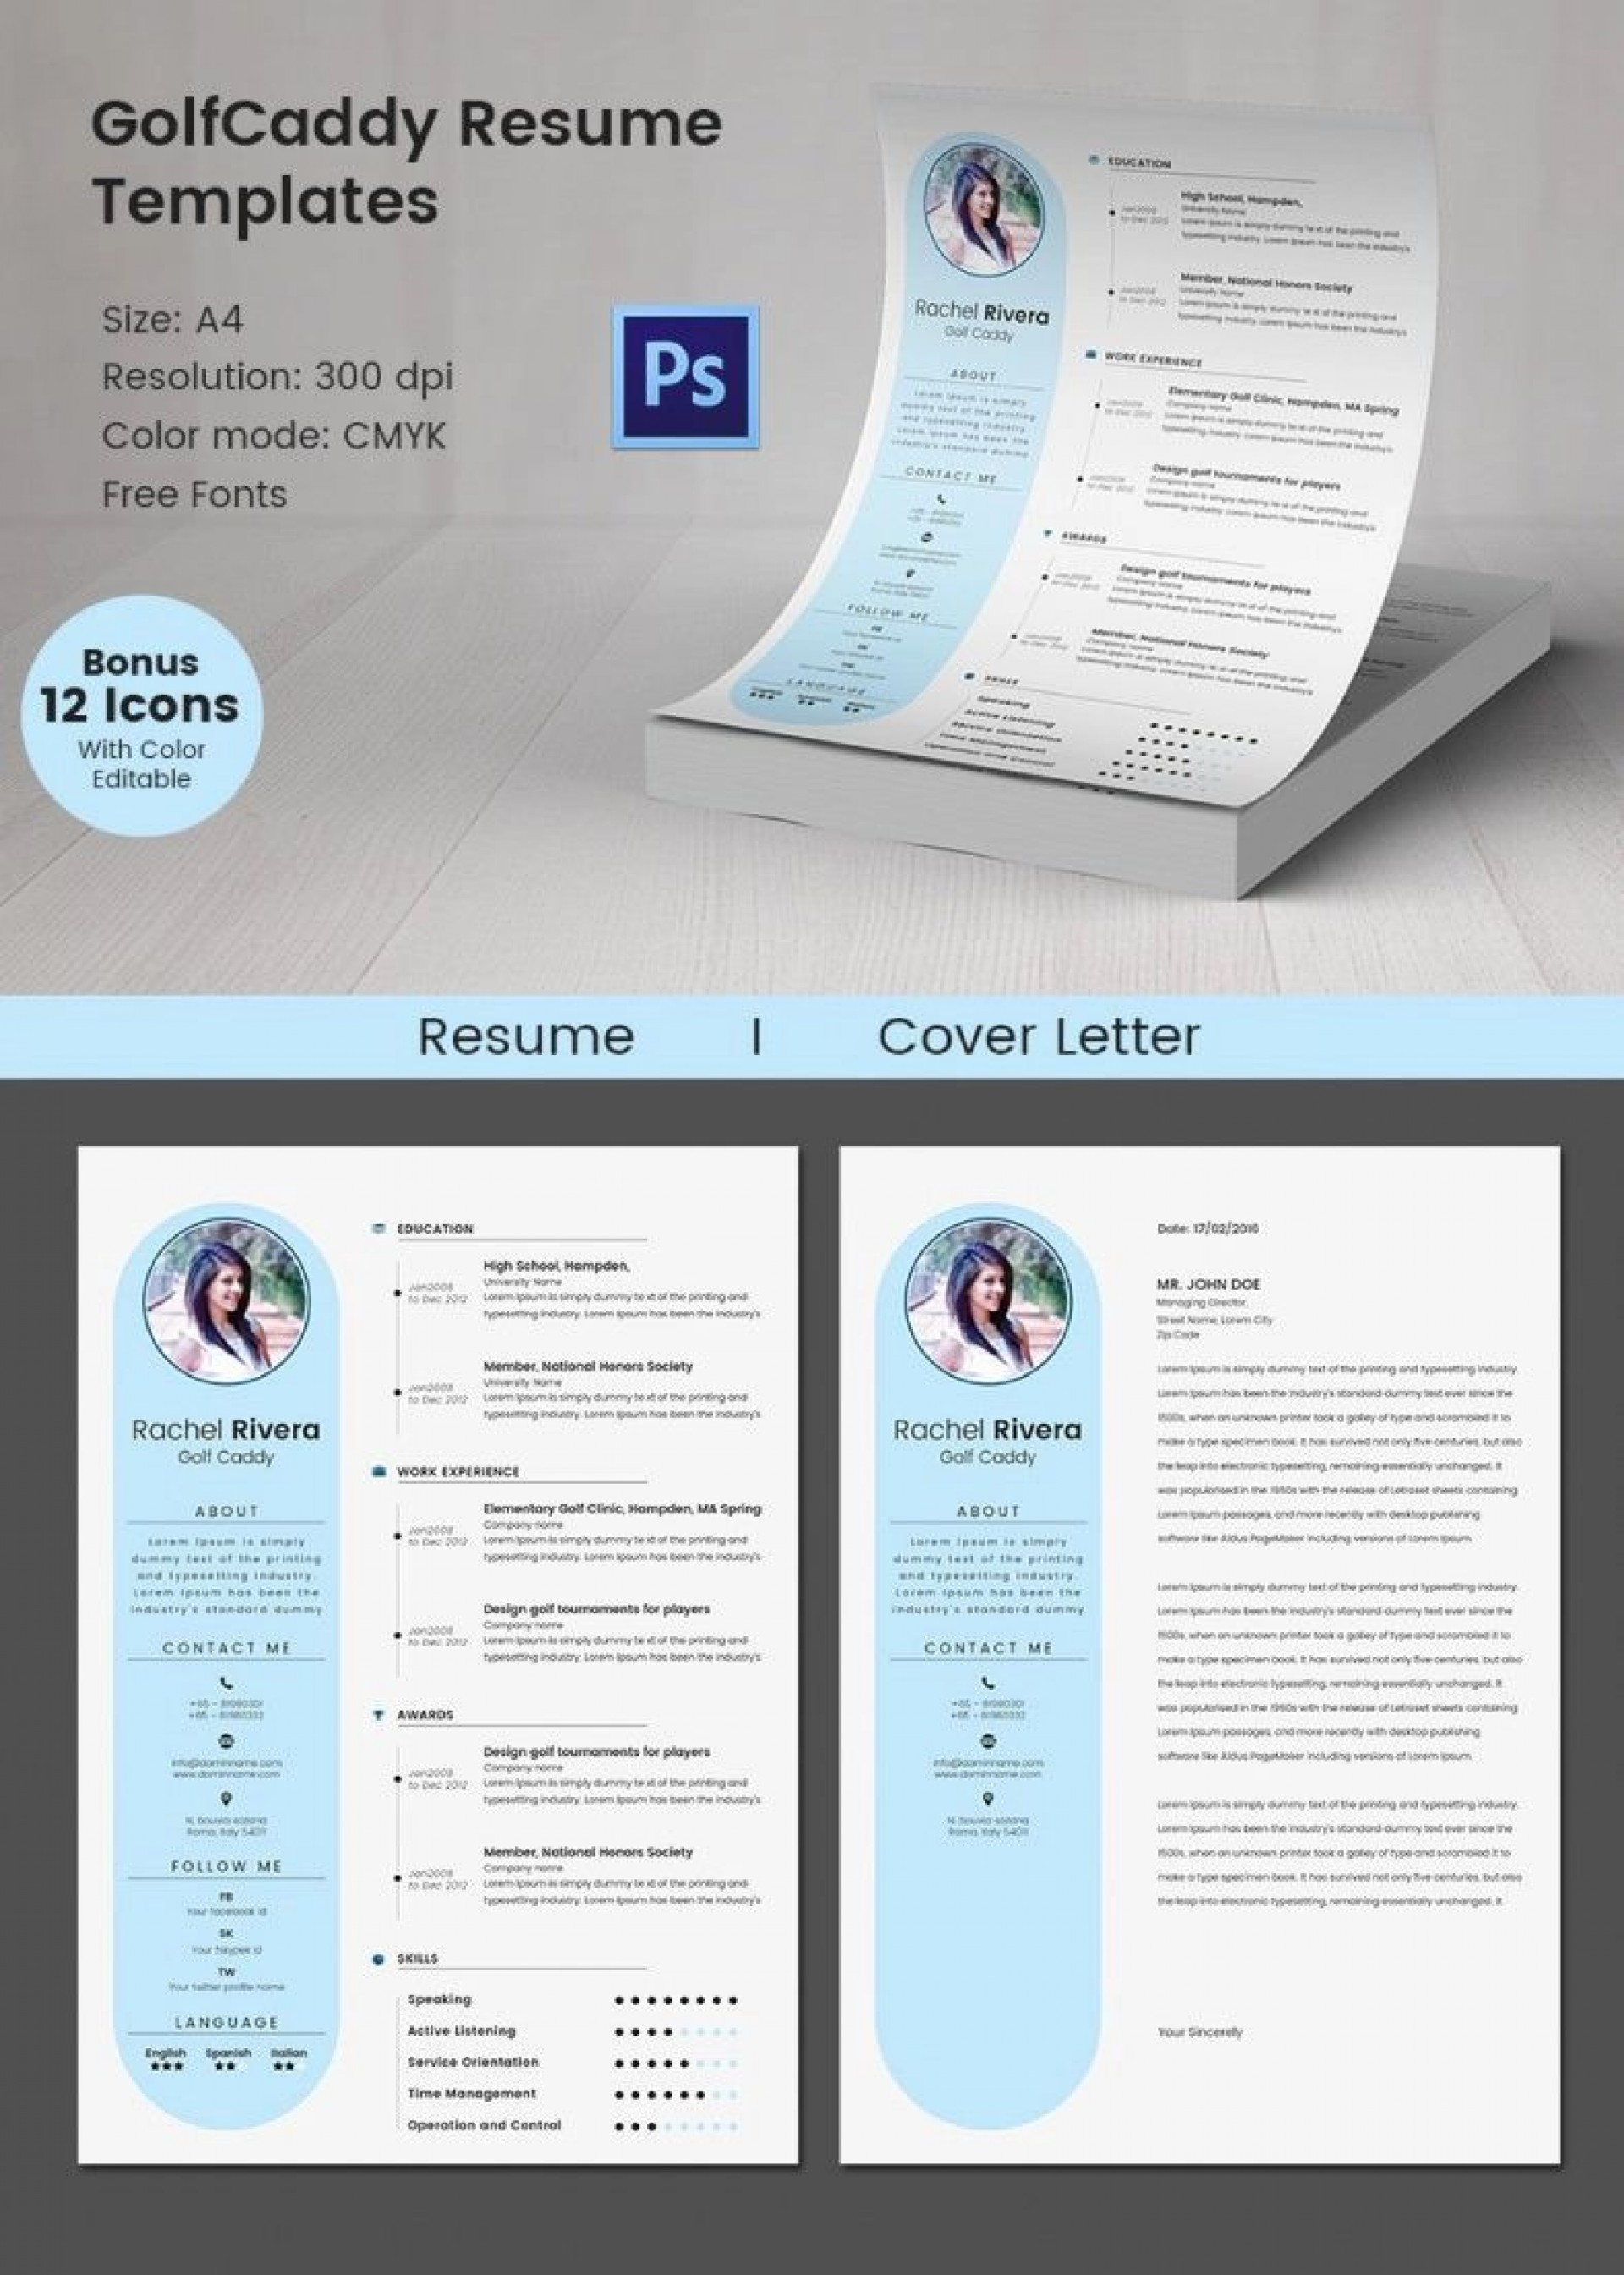 009 Excellent Software Engineering Resume Template High Def  Engineer Microsoft Word Cv Free Developer Download1920